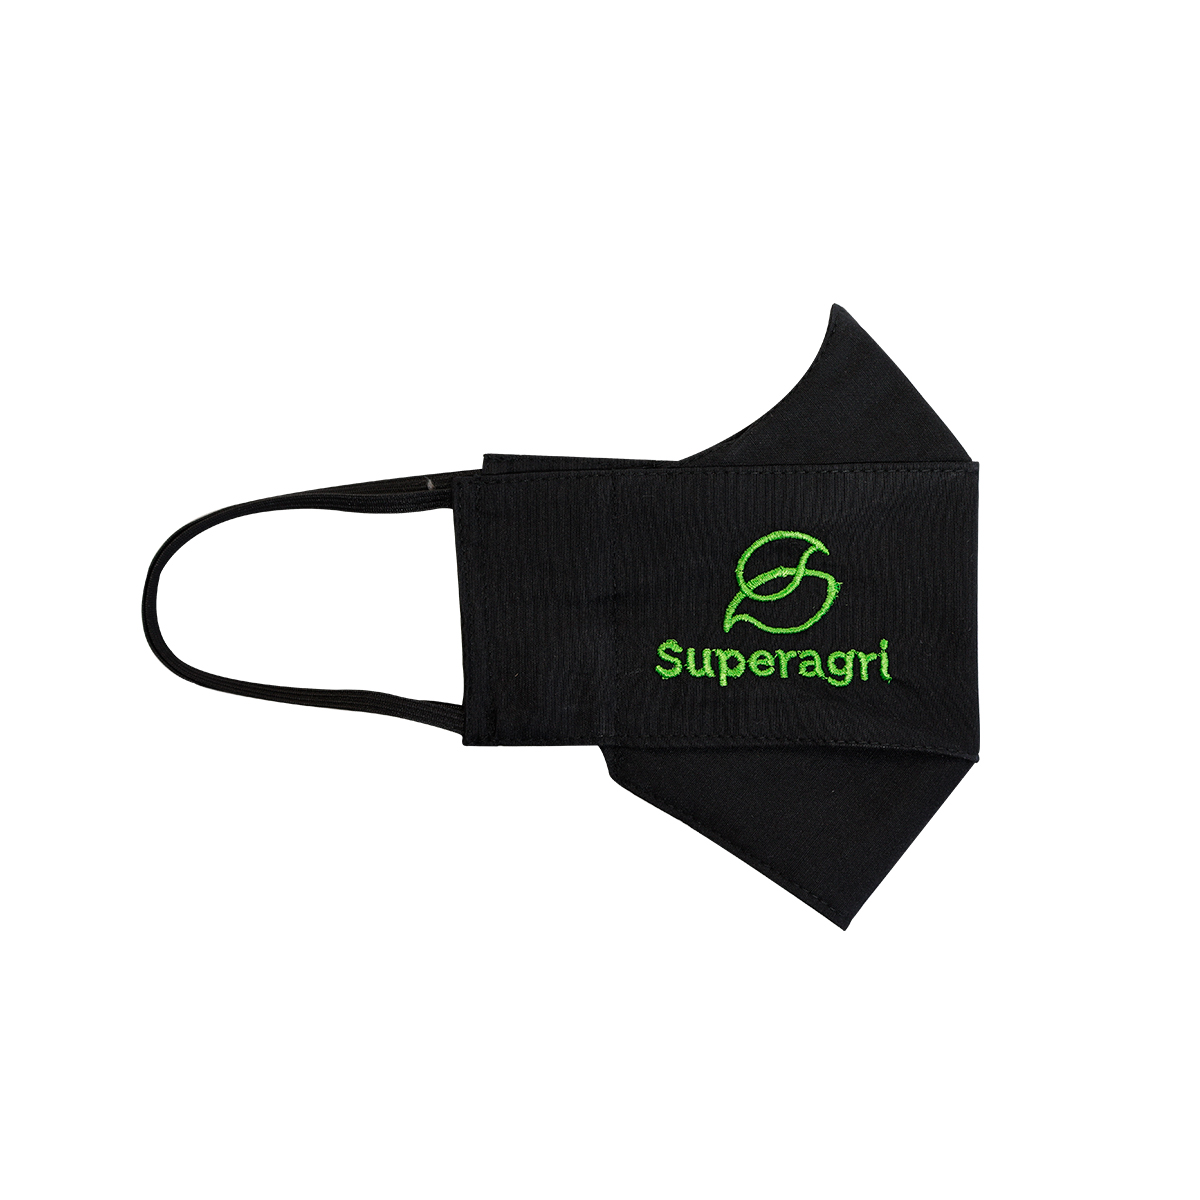 Kit Máscara SuperAgri + Dux Defender Hidratante Antisseptico 200g